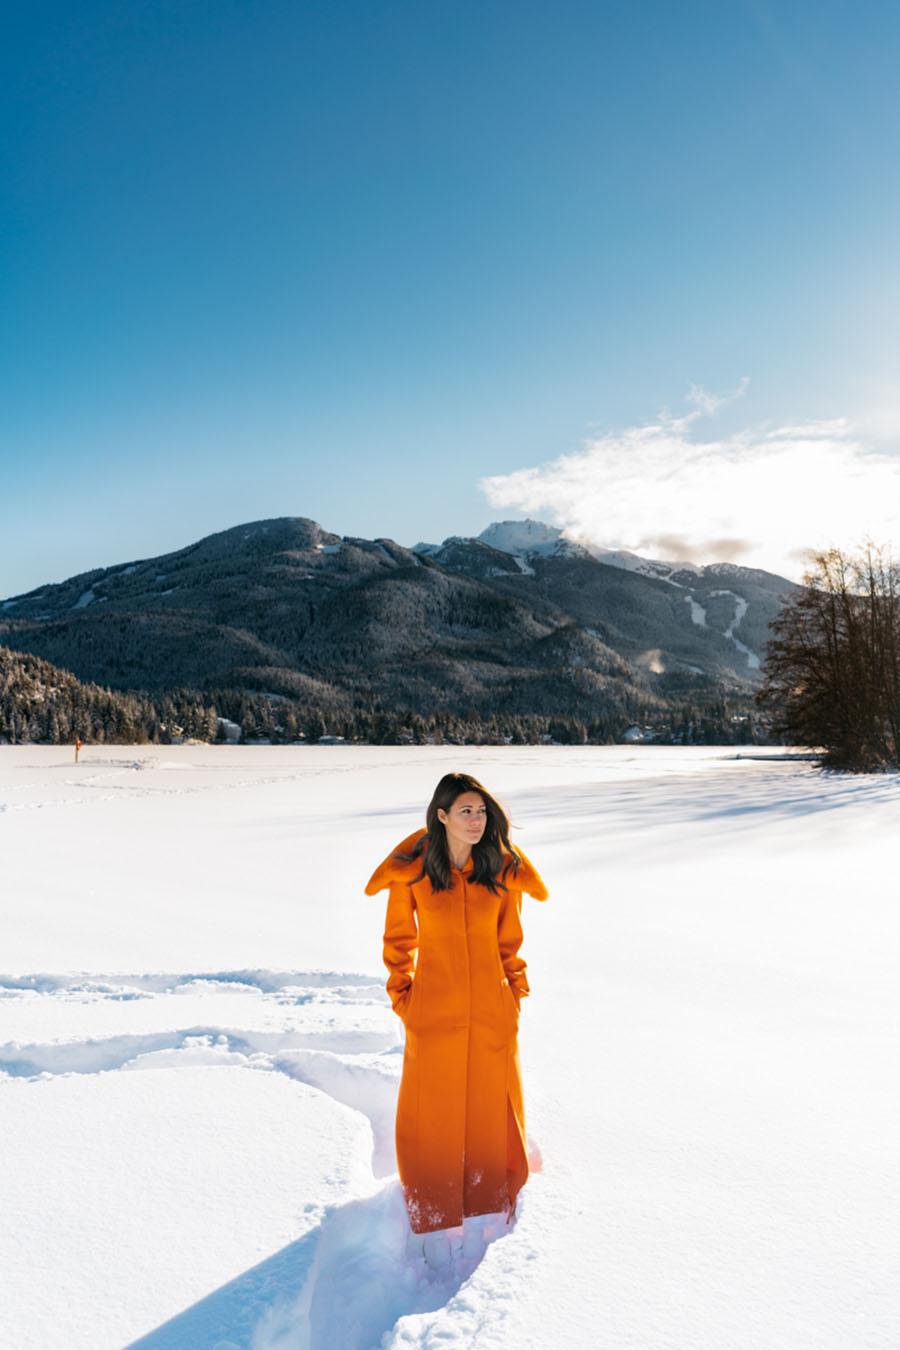 Salvatore Ferragamo Padded Wool Blend Coat in Orange Whistler Snow Outfit DSC07446.jpg